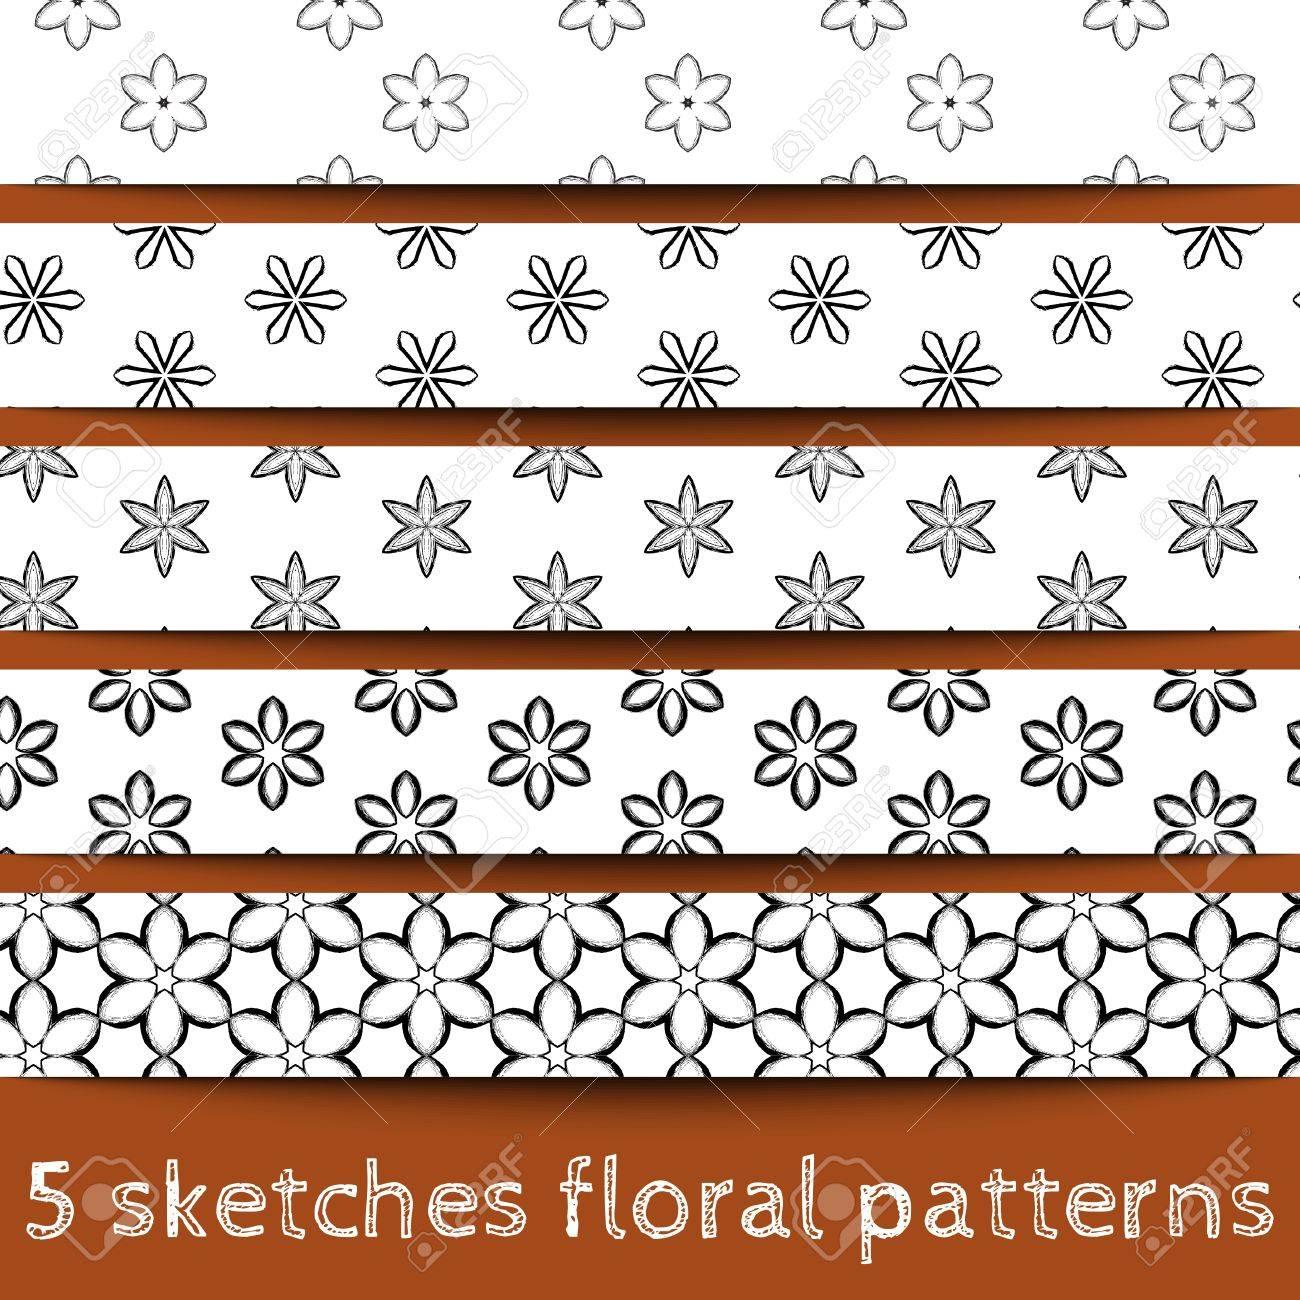 Set of sketches floral patterns. Sketched flower. Sketchy illustration. Sketchy background. Hand drawn. Vector, format eps10 Stock Vector - 16213135